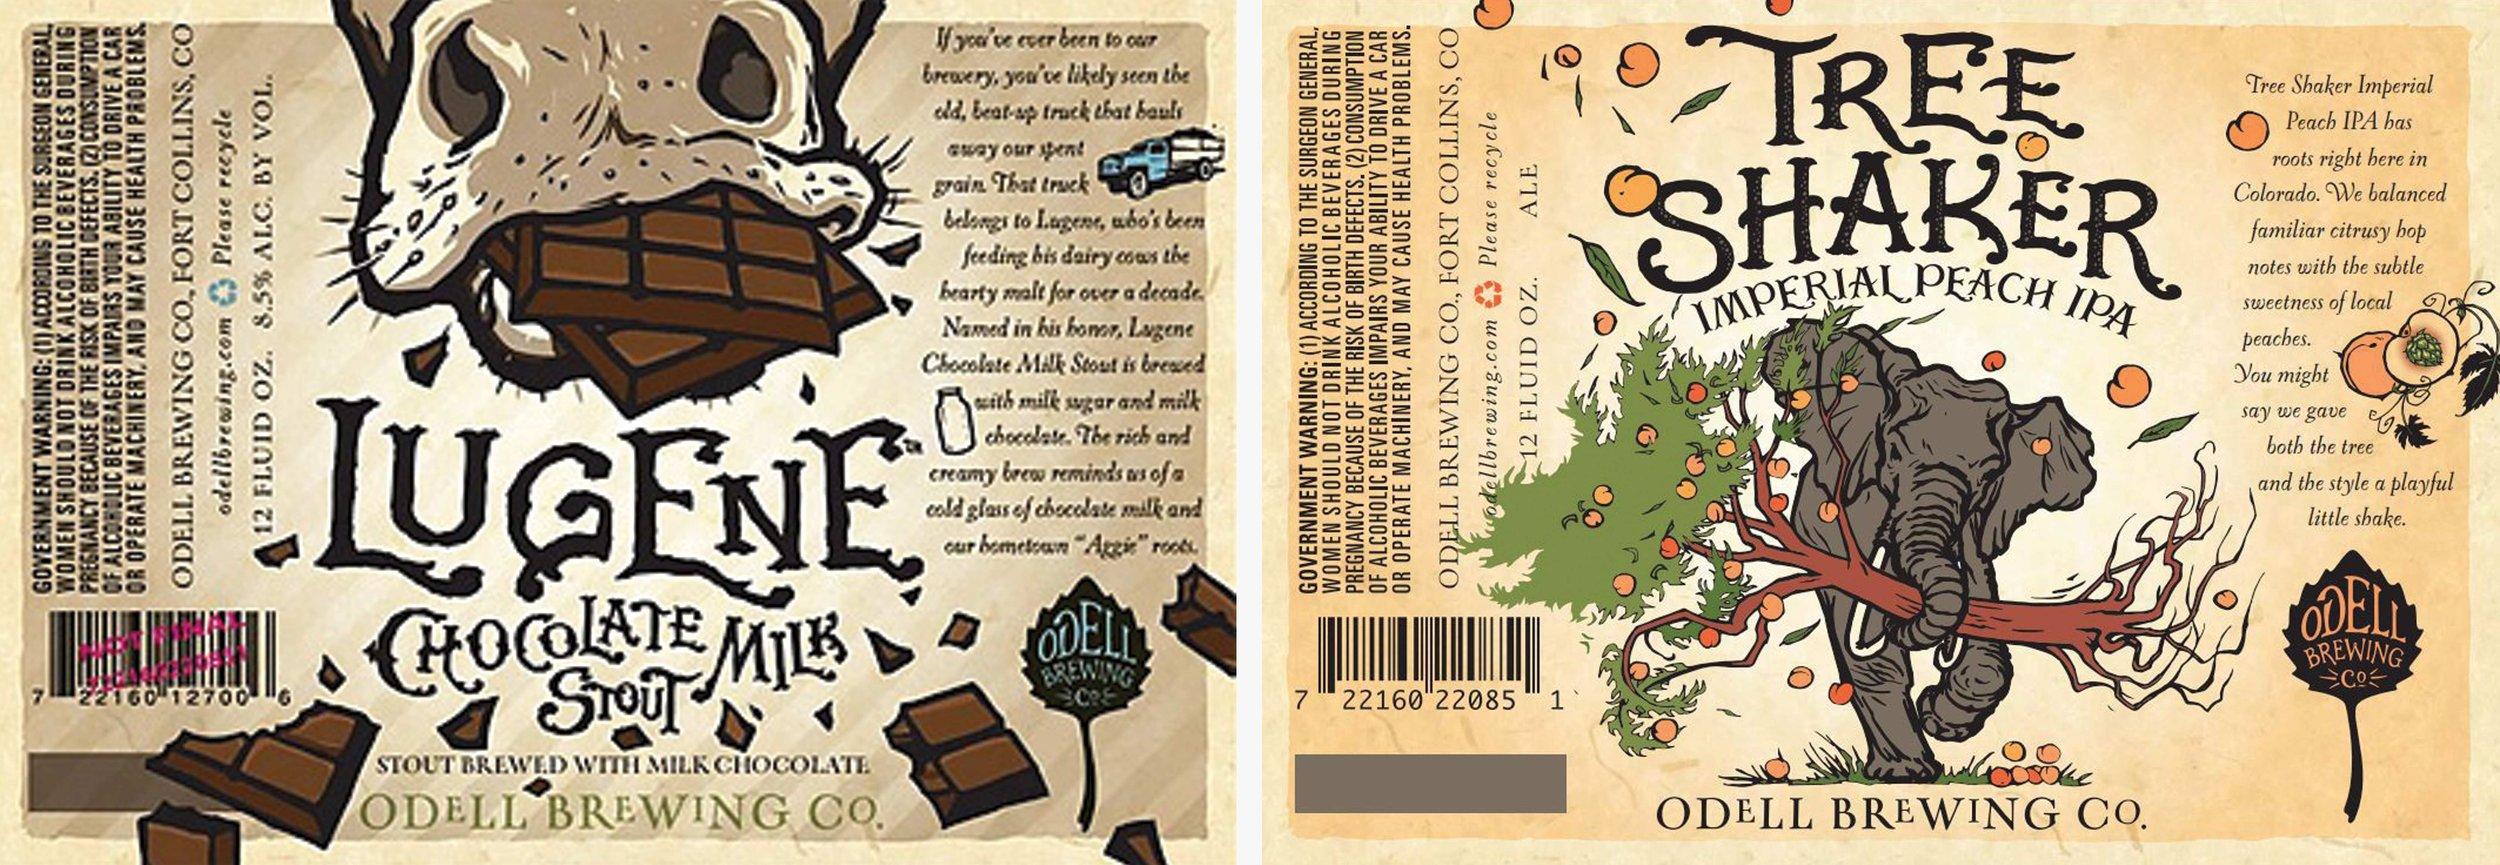 Odell-Brewing-Label-Design-Branding_Lugene-Chocolate-Milk-Stout-Tree-Shaker.jpg